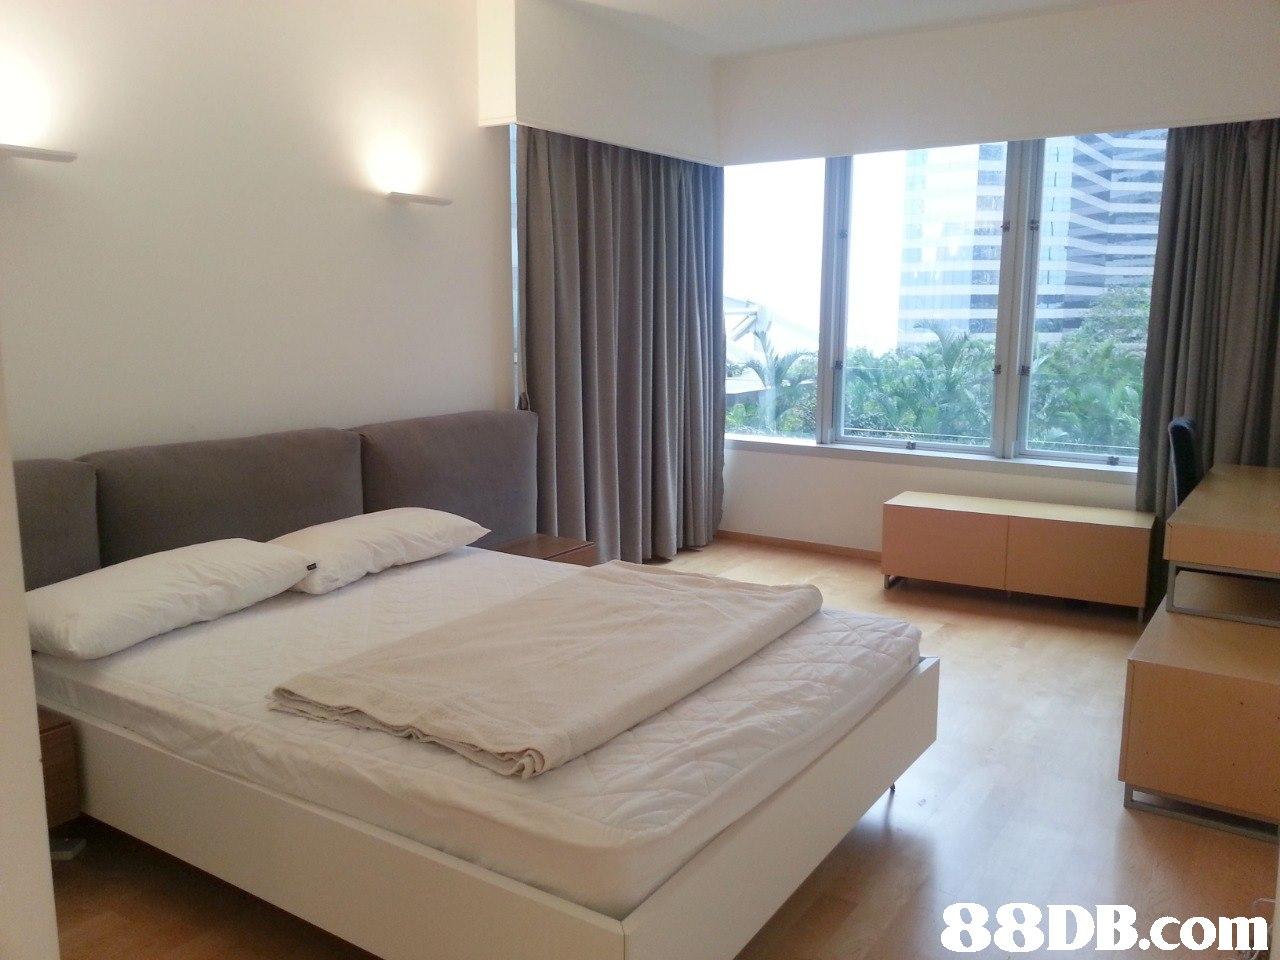 at   property,room,bedroom,real estate,condominium